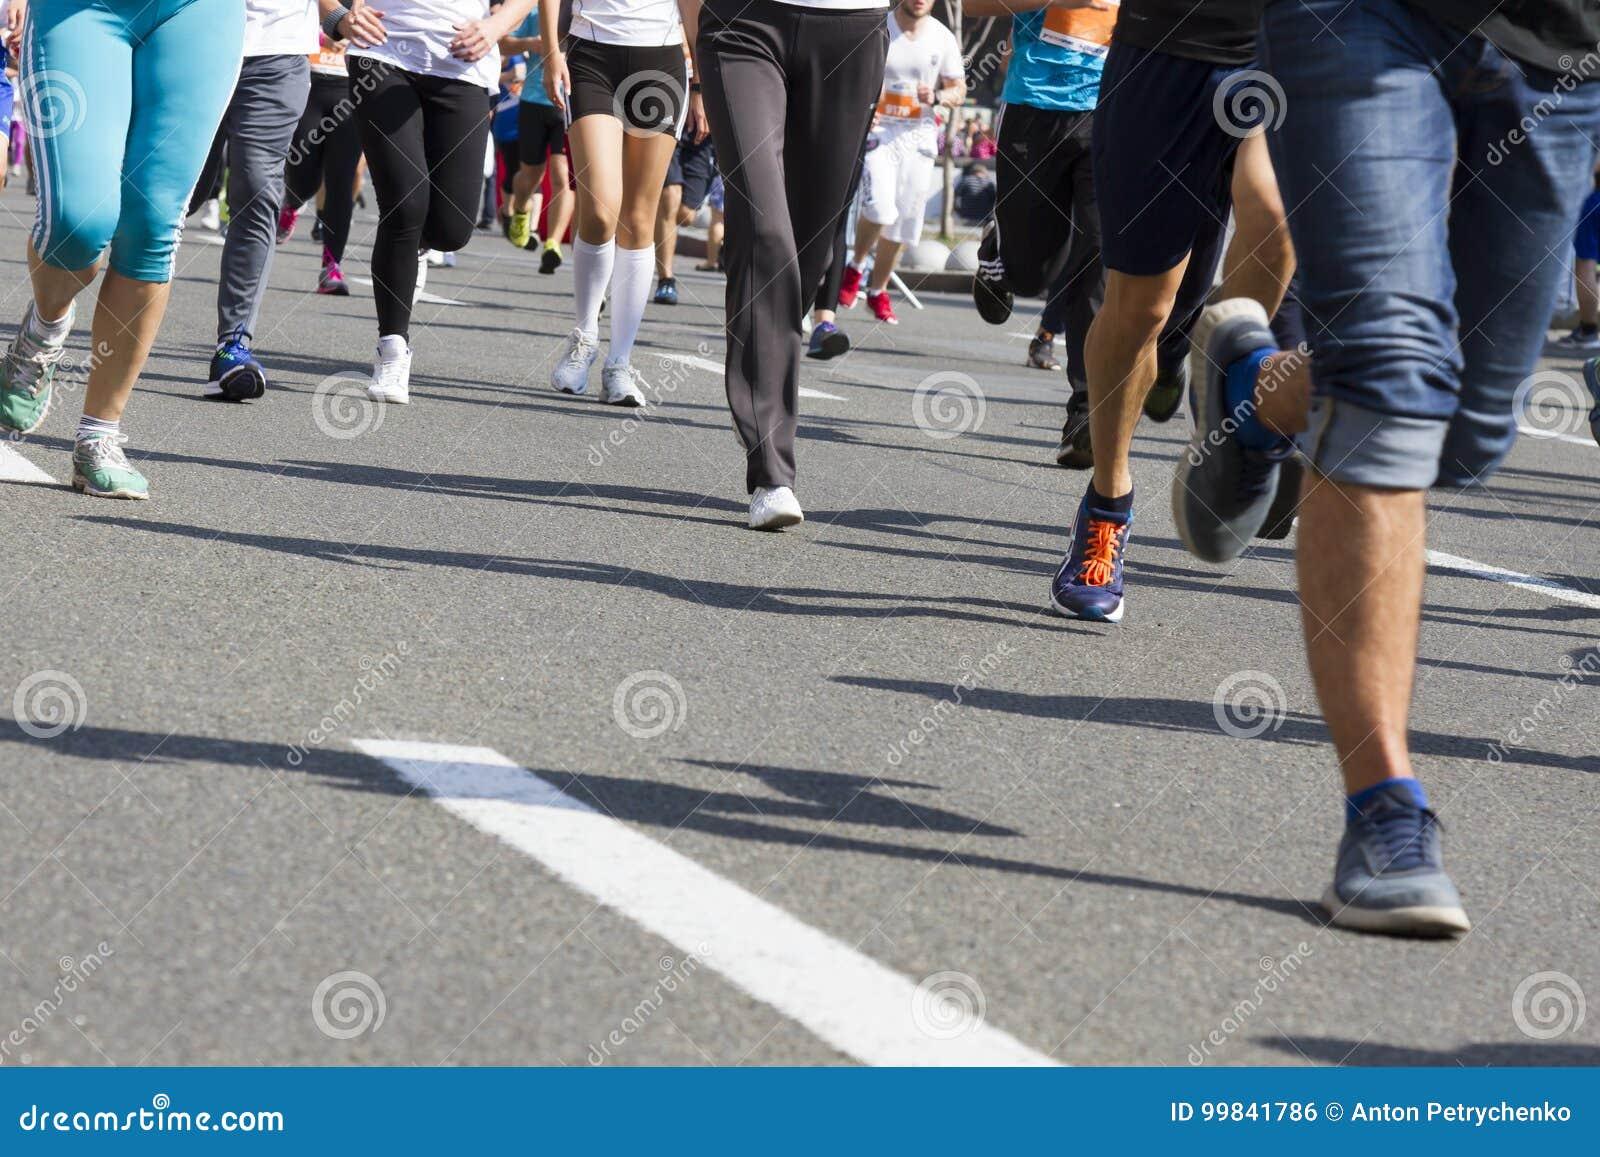 photos officielles 3e2e9 046db Marathon Running Race, People Feet On Road, Sport, Fitness ...